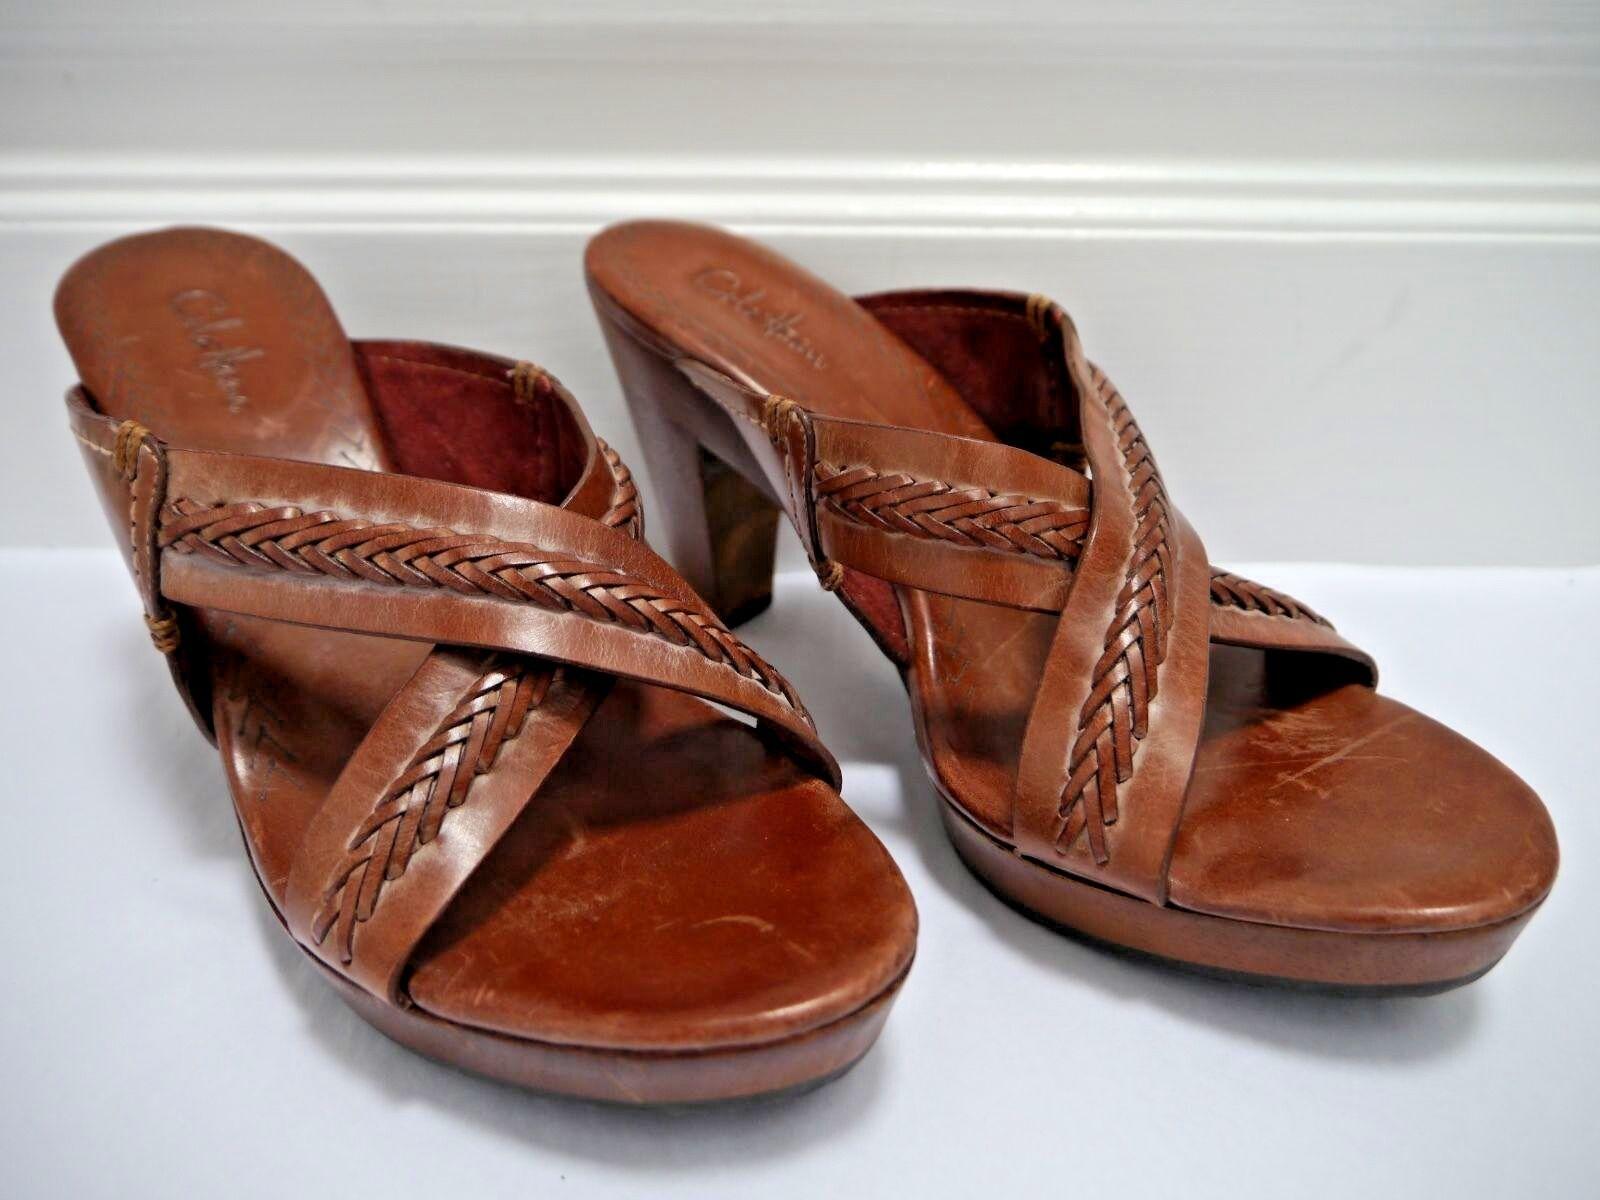 NWT JCREW   JCREW Glitter Cora crisscross sandals Sz6.5 Buff Glitter H7334 85ec2d